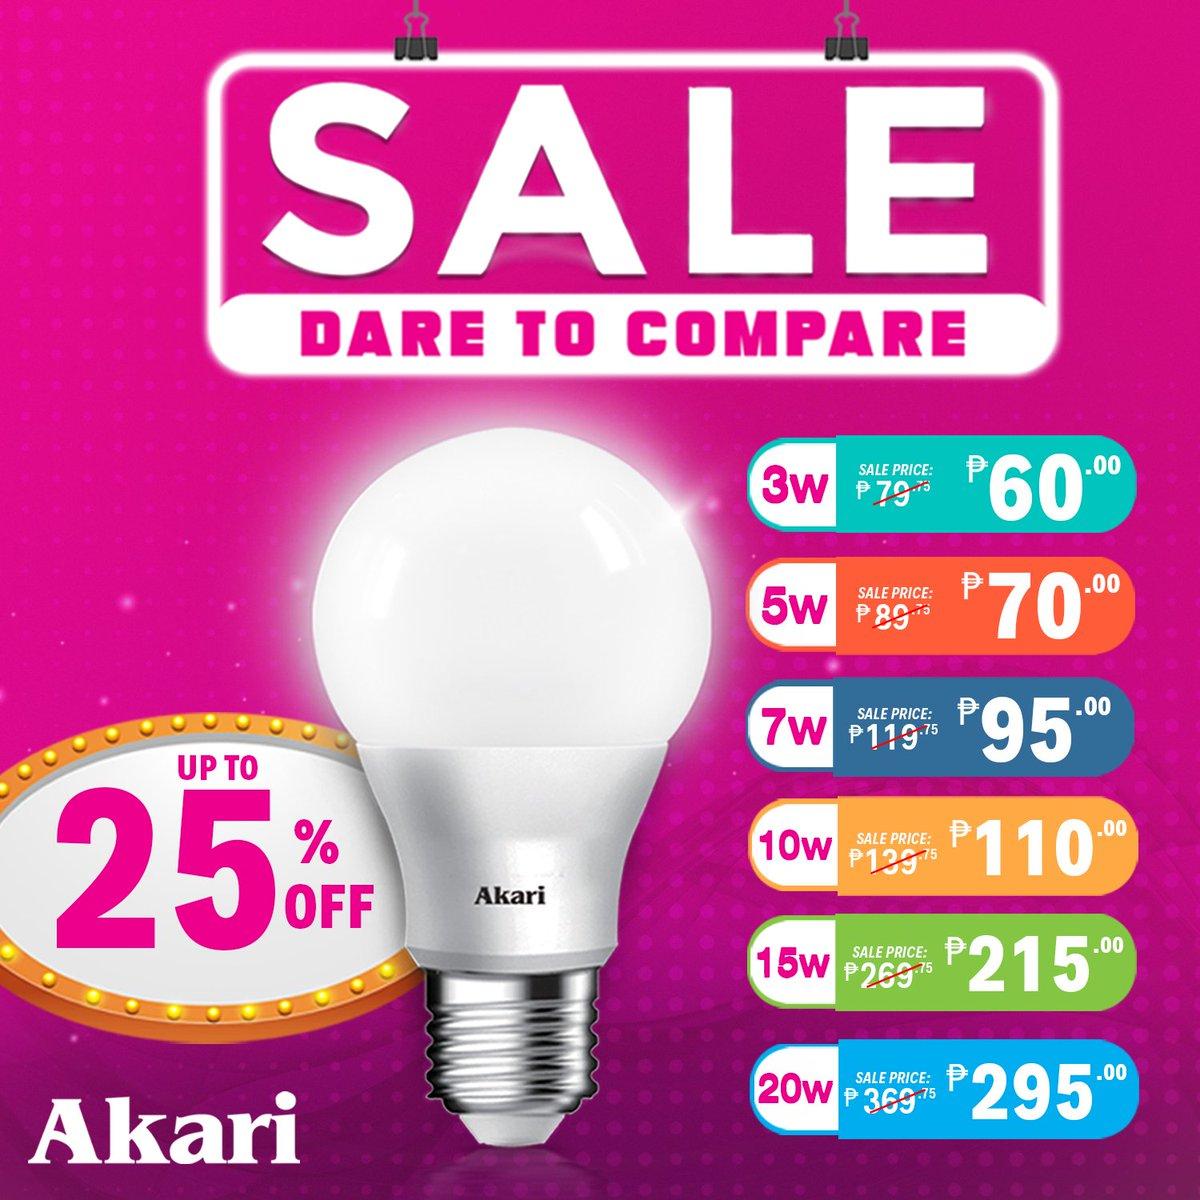 Akari Lighting On Twitter Upgrade Your Home This